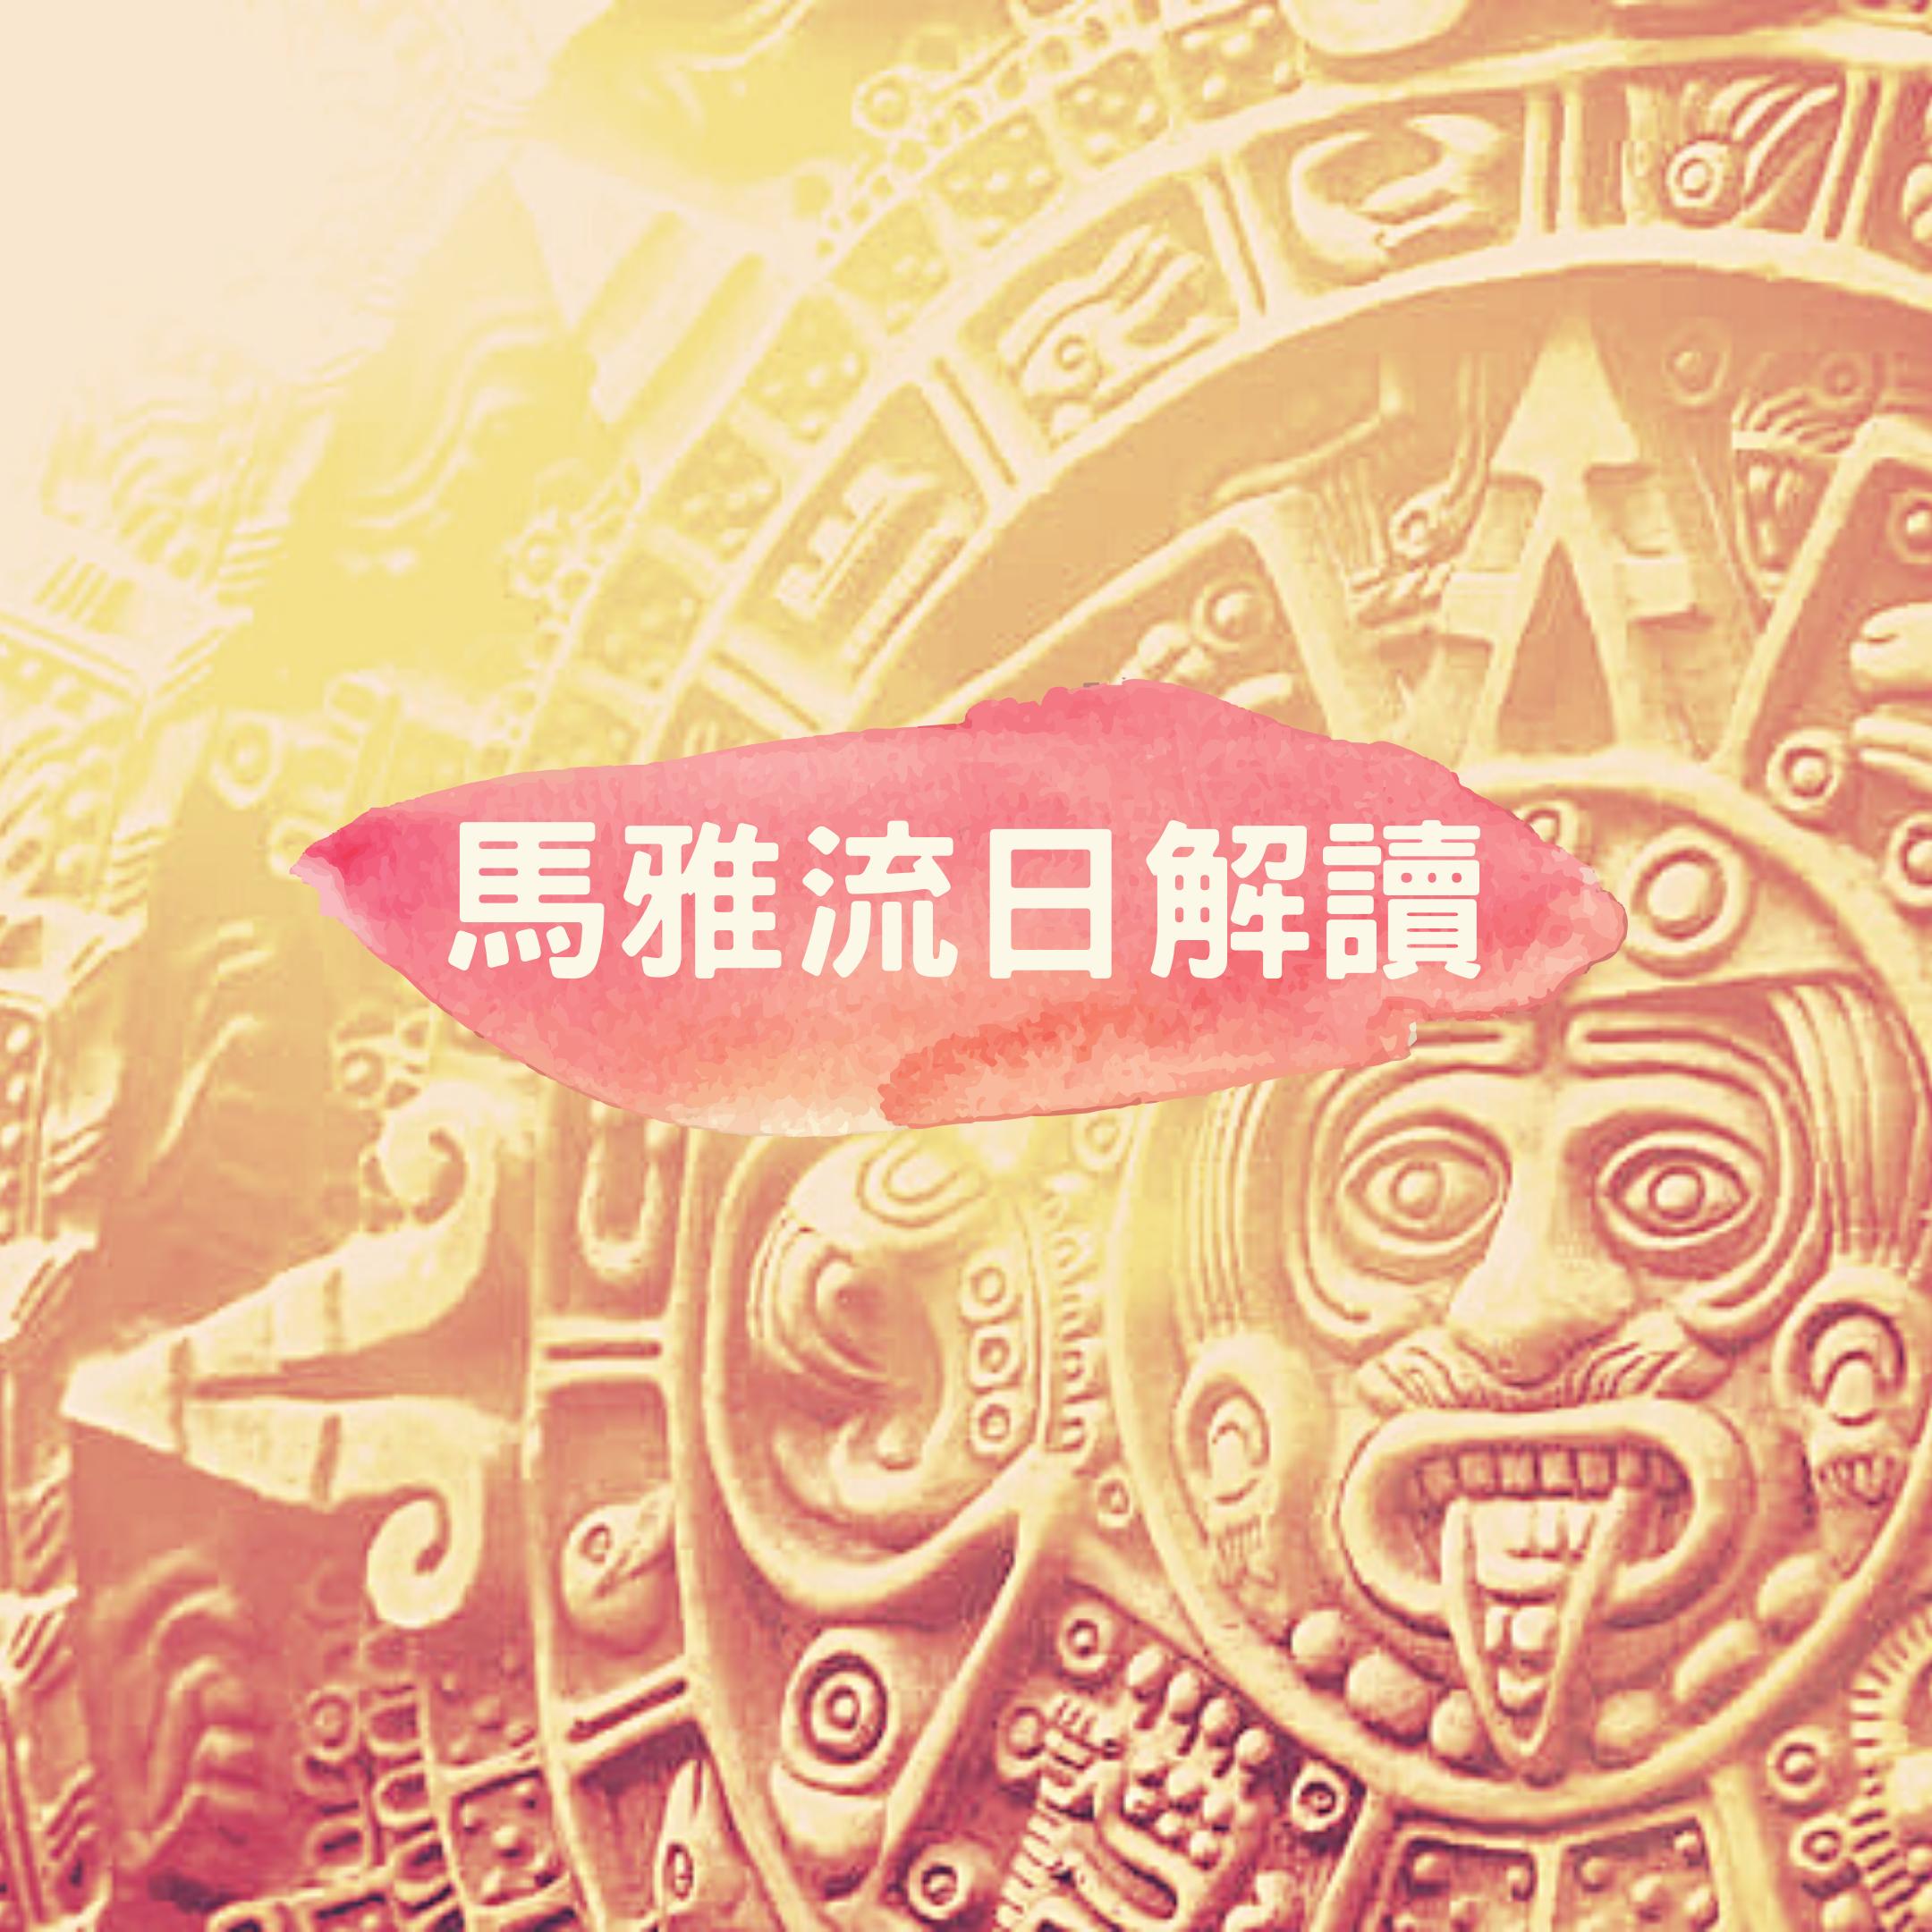 馬雅流日09.25|kin 180 光譜黃太陽